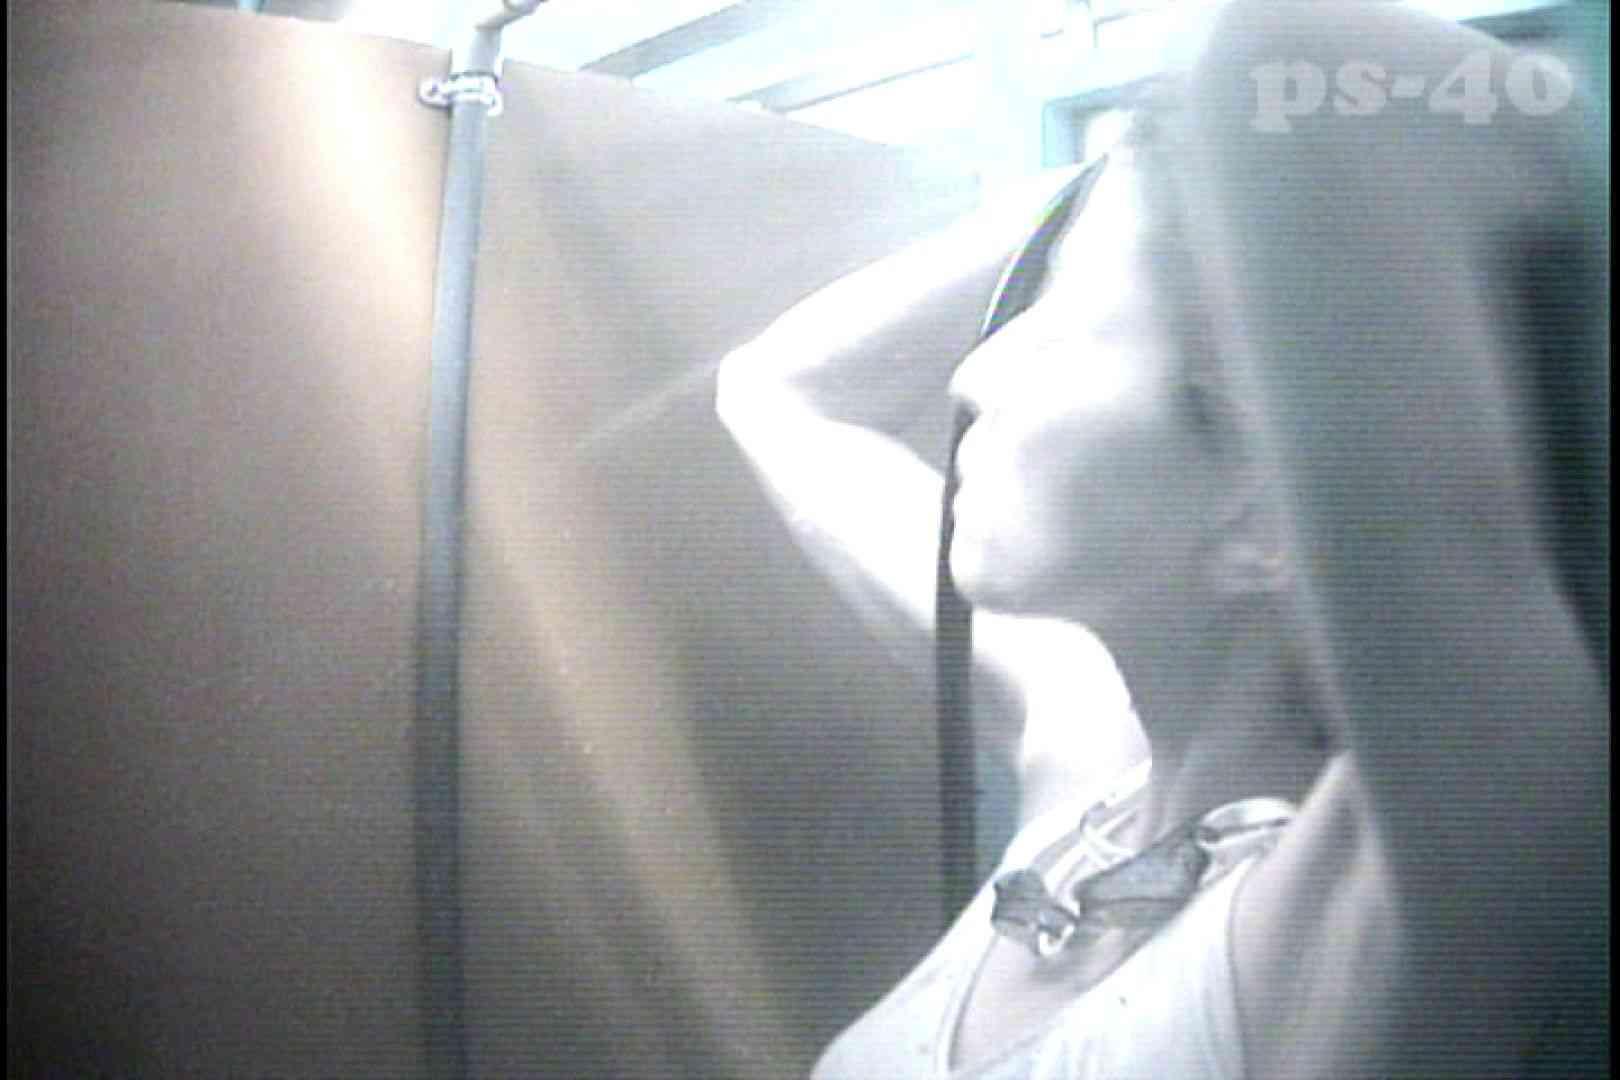 File.40 スレンダーお女市さんの一瞬見せるたれたおっぱい 盗撮で悶絶 われめAV動画紹介 88画像 83